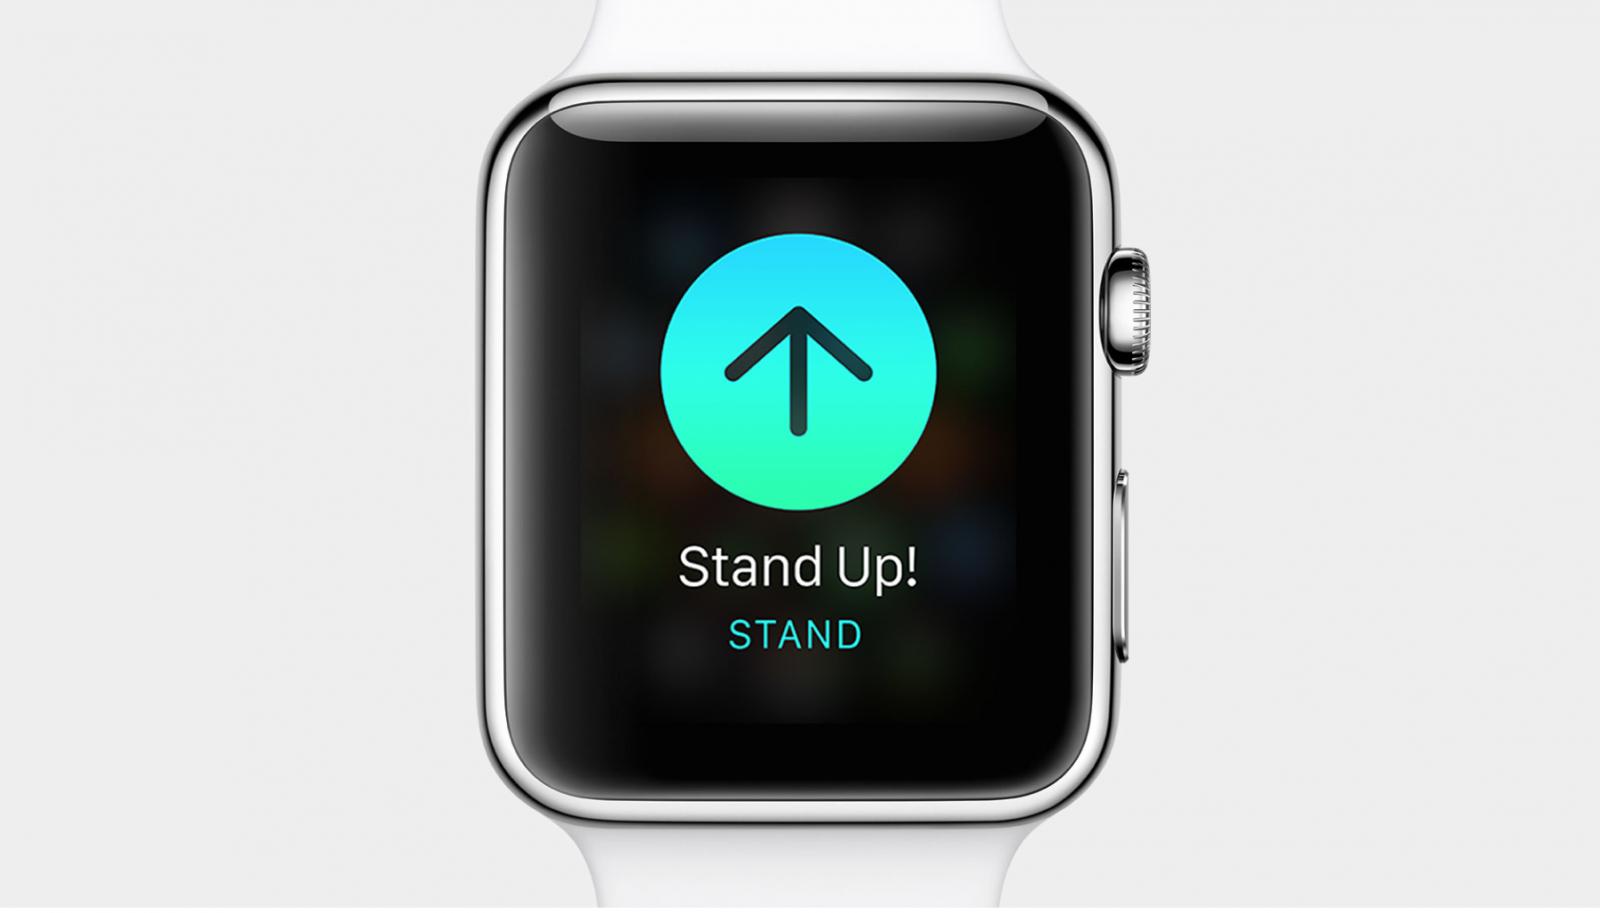 Apple Watch livestream